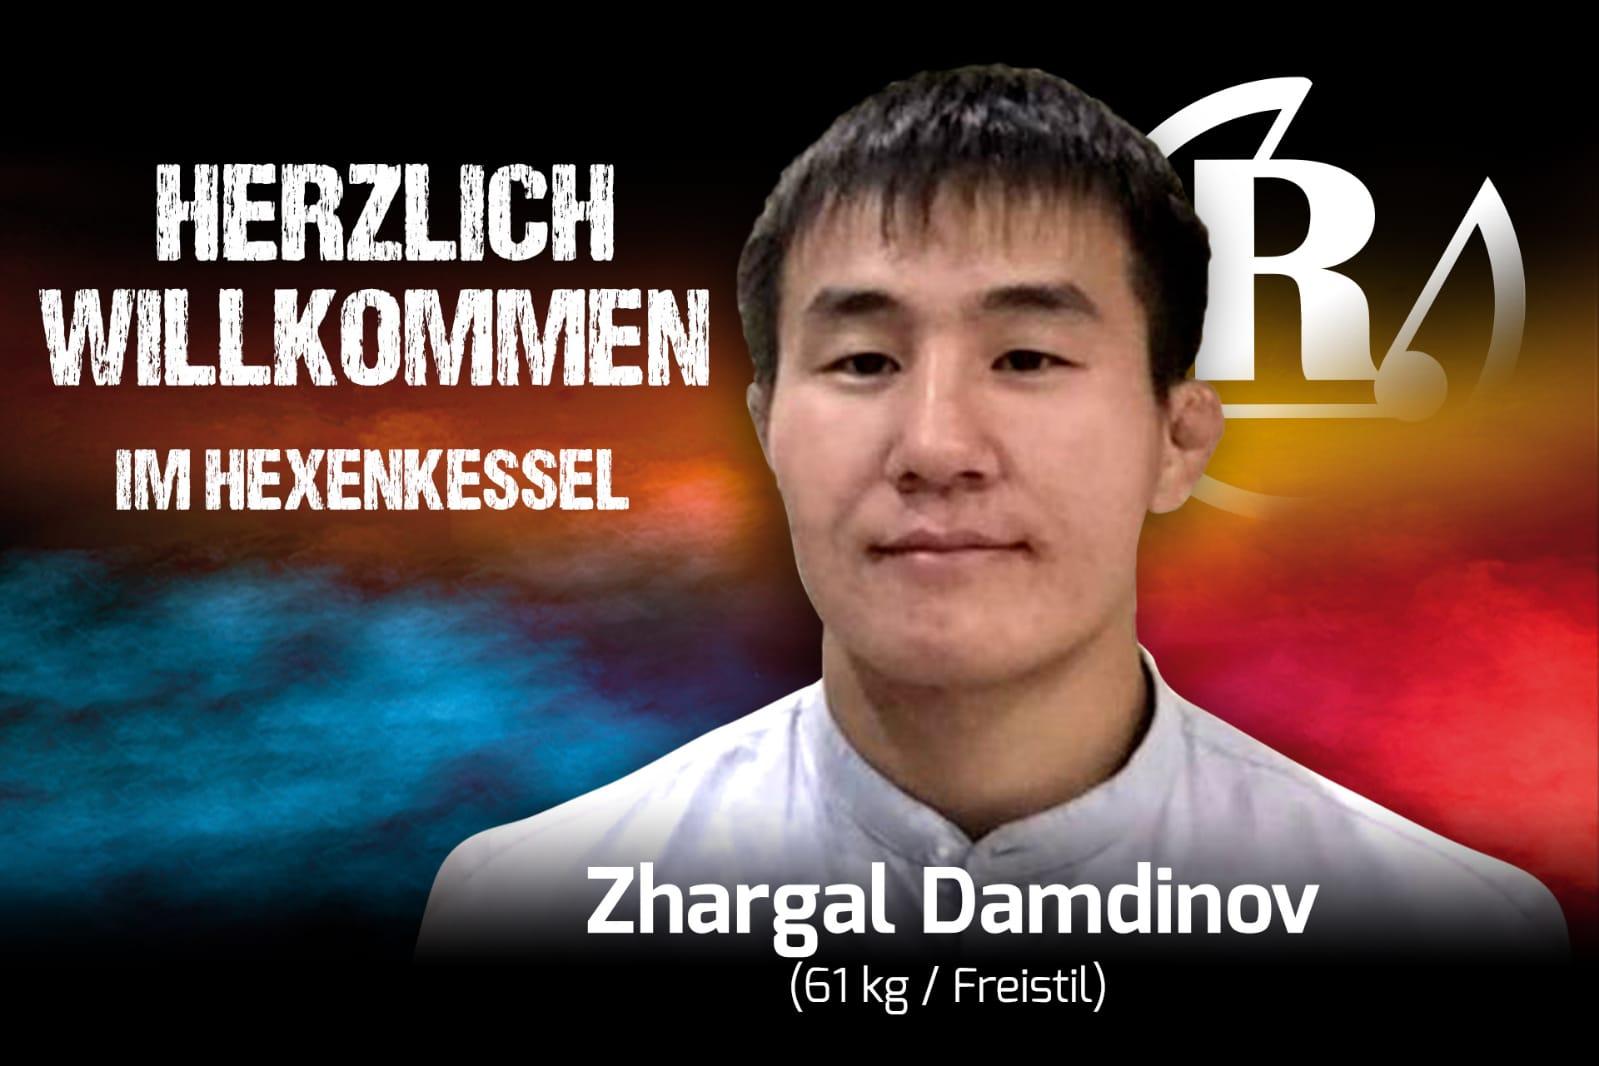 Zhargal Damdinov